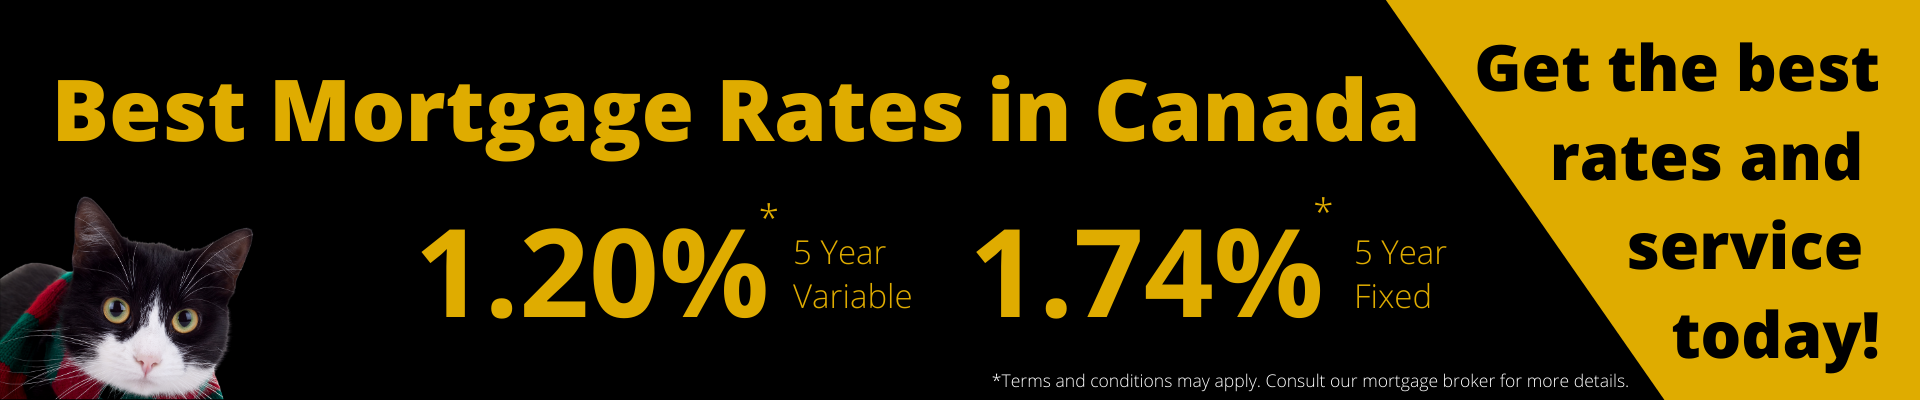 Rates4u _ Citadel Mortgages Best Mortgage Rates - Canada Prime Rate - BMO - CIBC -TD -HSBC-Scotia bank-Tangerine- National Bank - Defjardins - Best Mortgage Rates 16